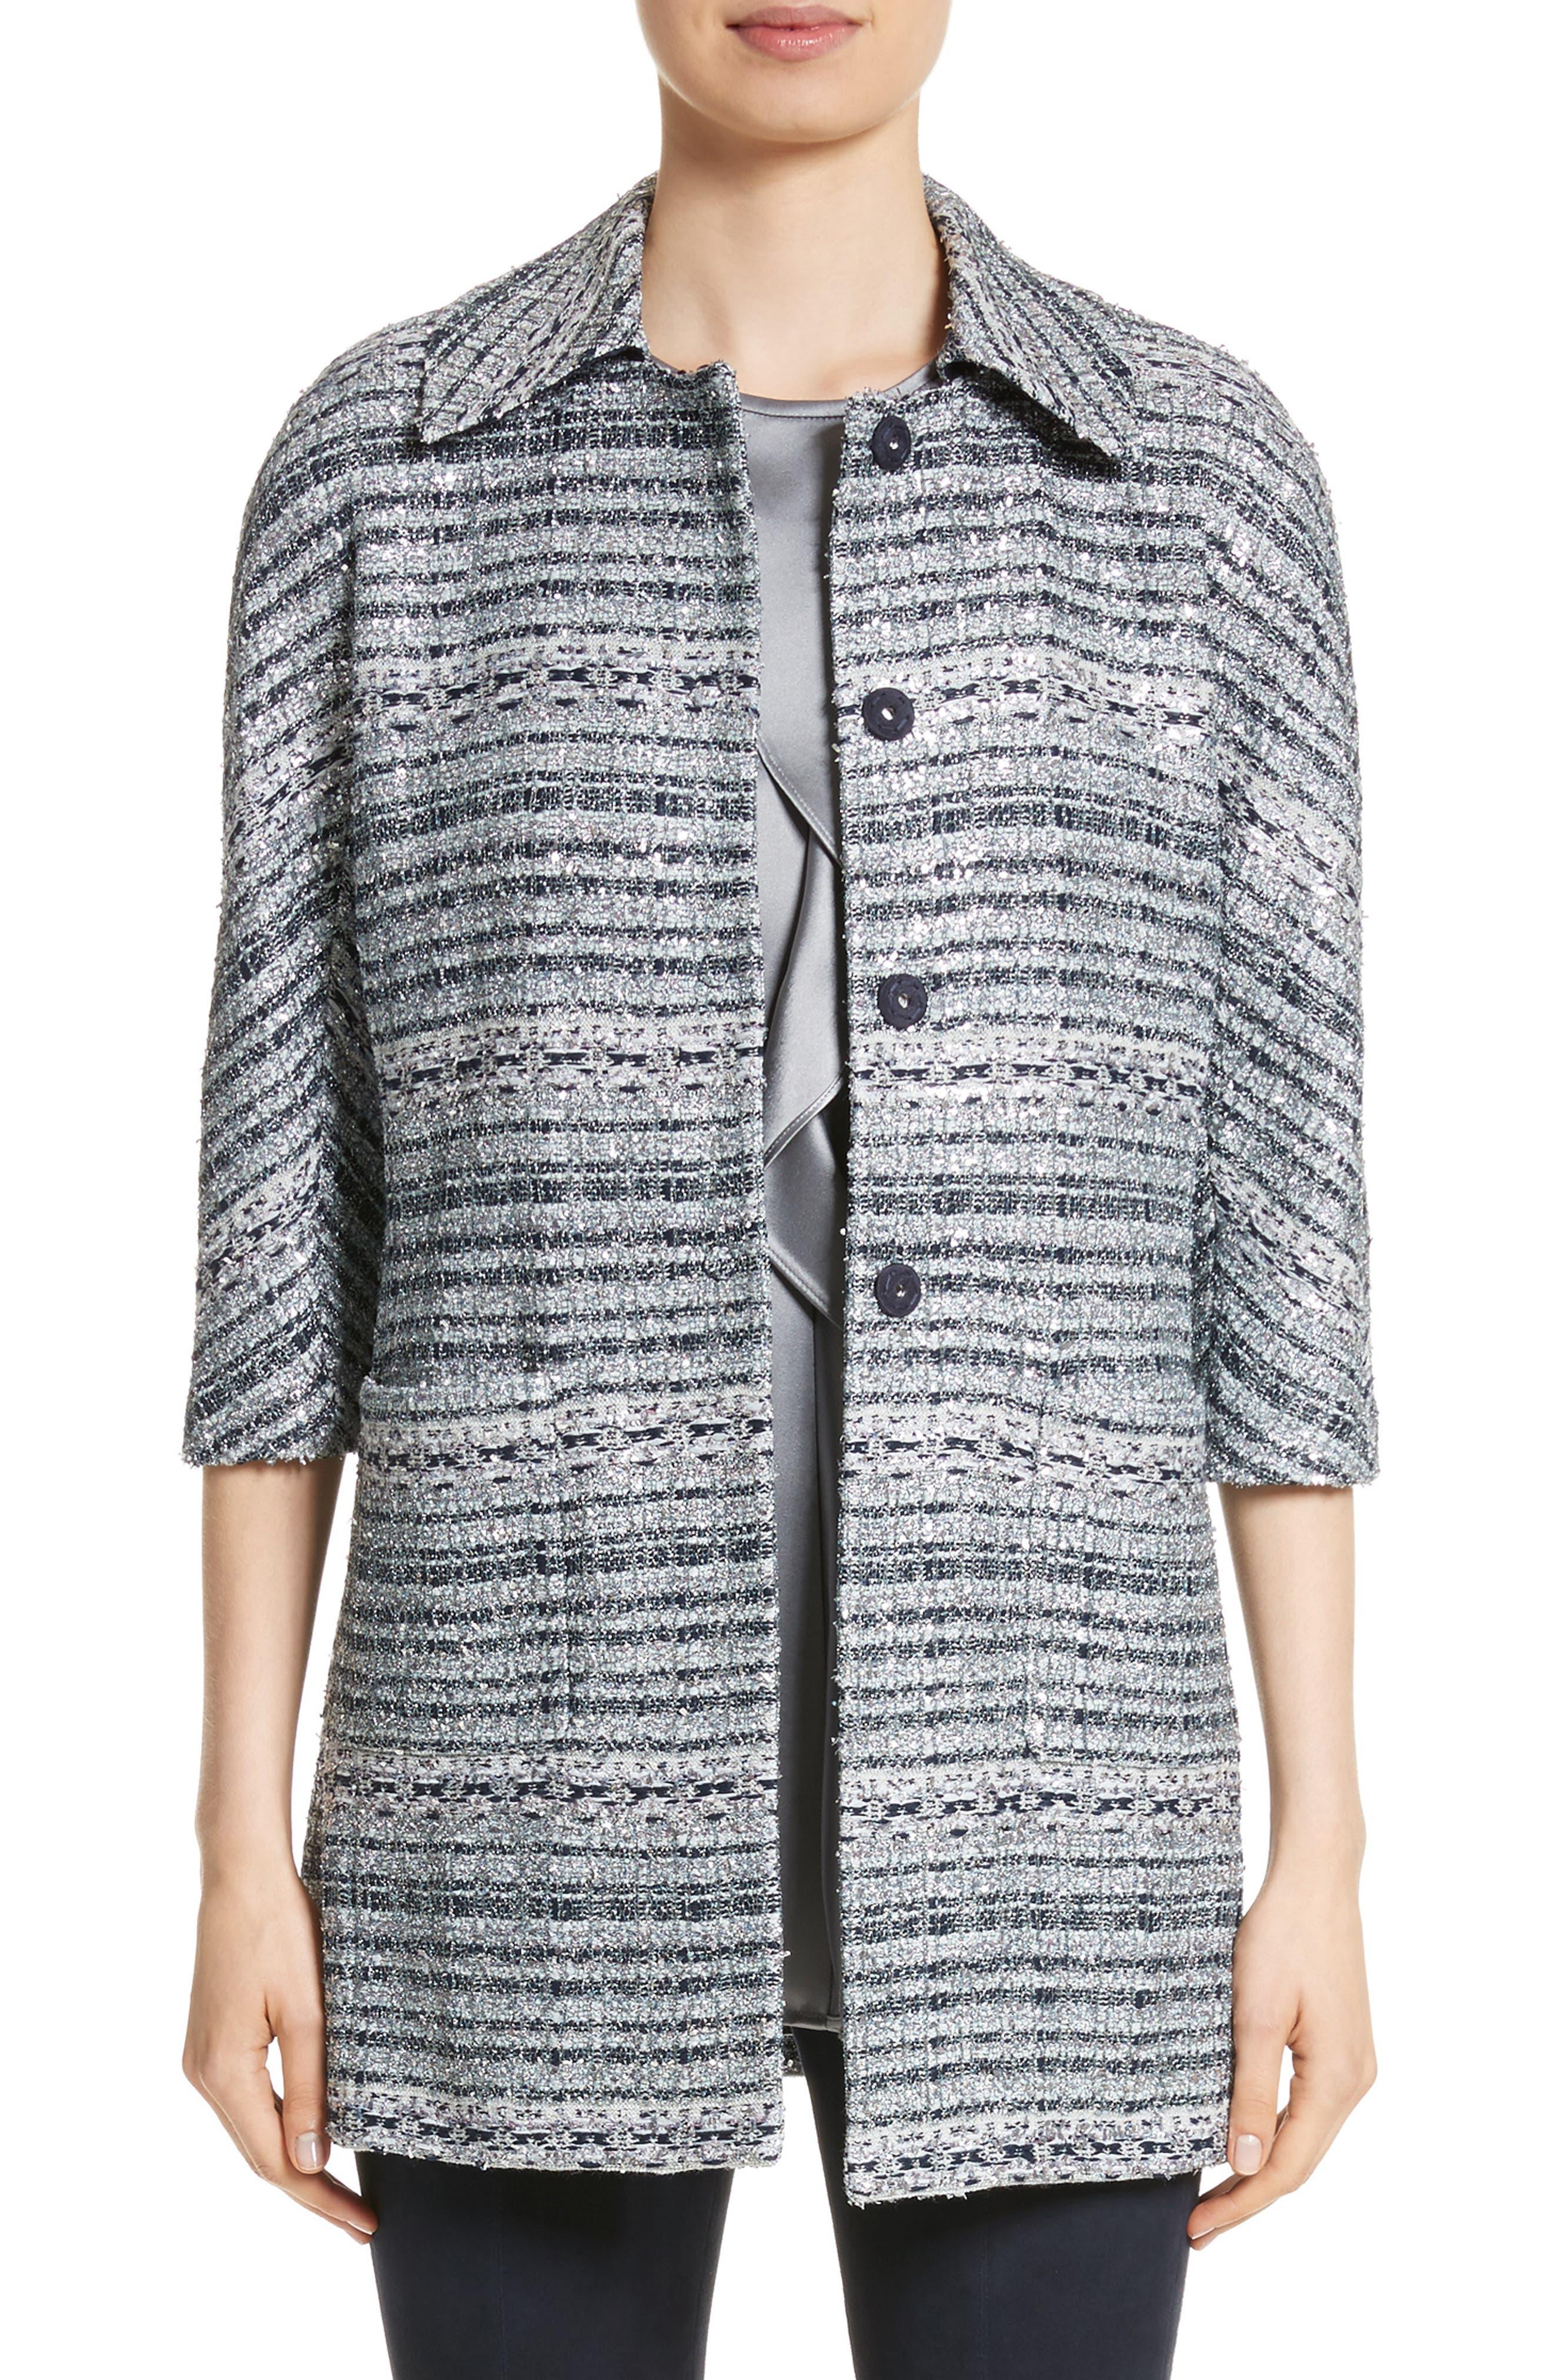 Main Image - St. John Collection Lacquered Metallic Ribbon Knit Jacket